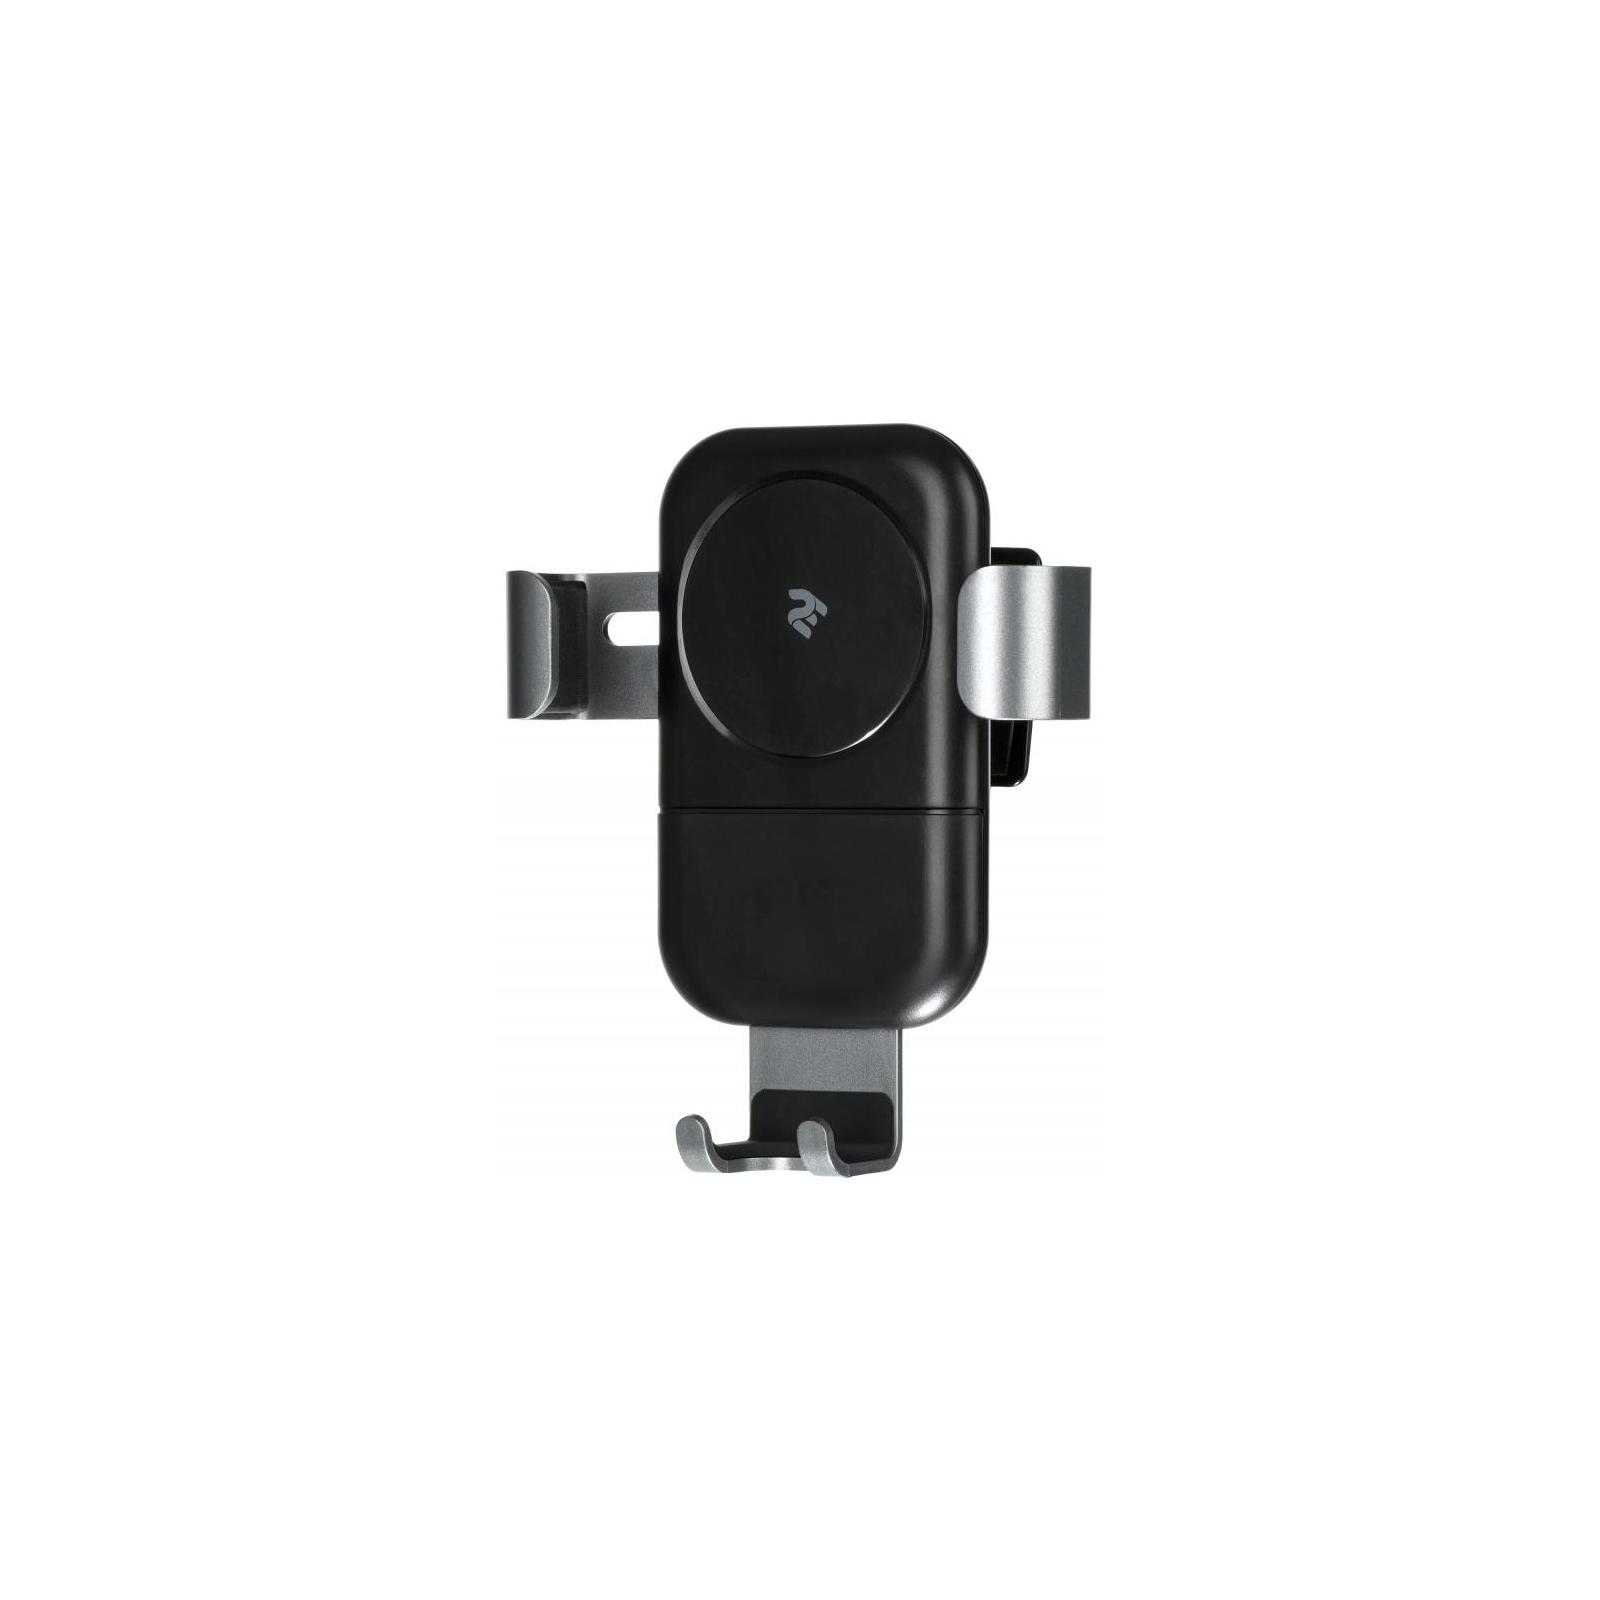 Зарядний пристрій 2E Gravity Car Mount Wireless Charger, 10W, black (2E-WCQ01-05)